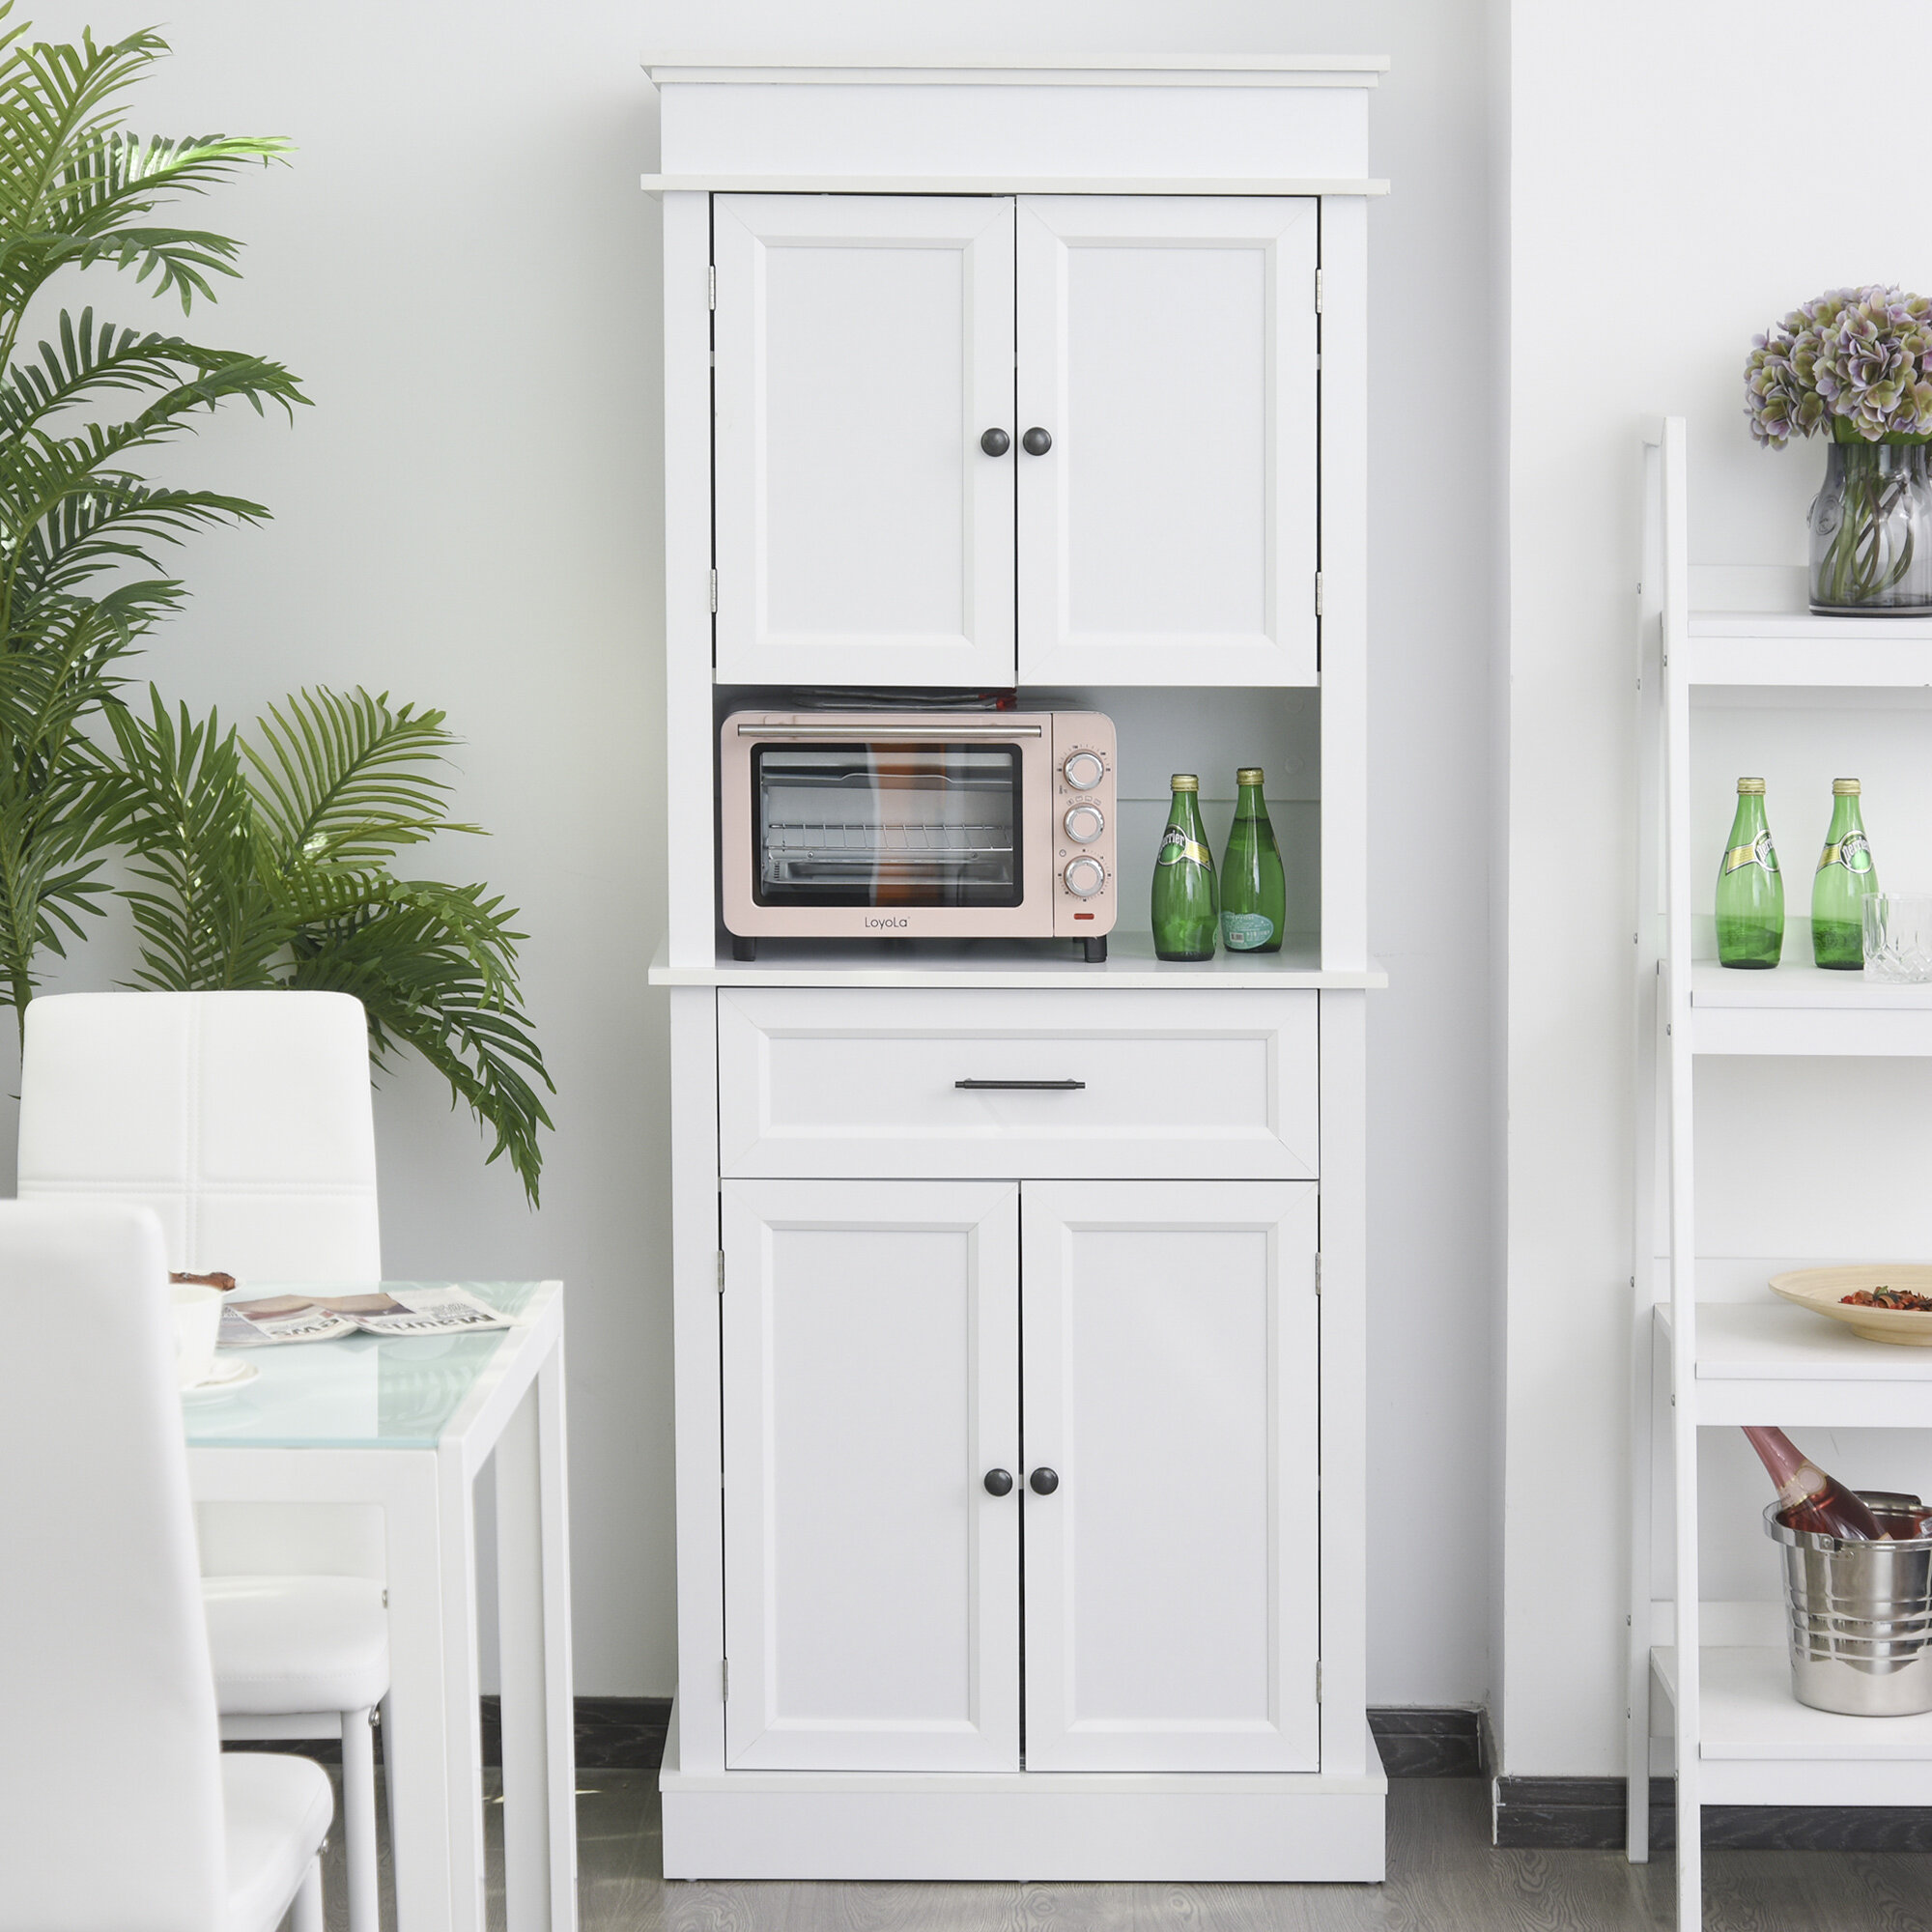 Red Barrel Studio Traditional Freestanding Kitchen Pantry Cabinet Cupboard With Doors And Shelves Adjustable Shelving Oak Wayfair